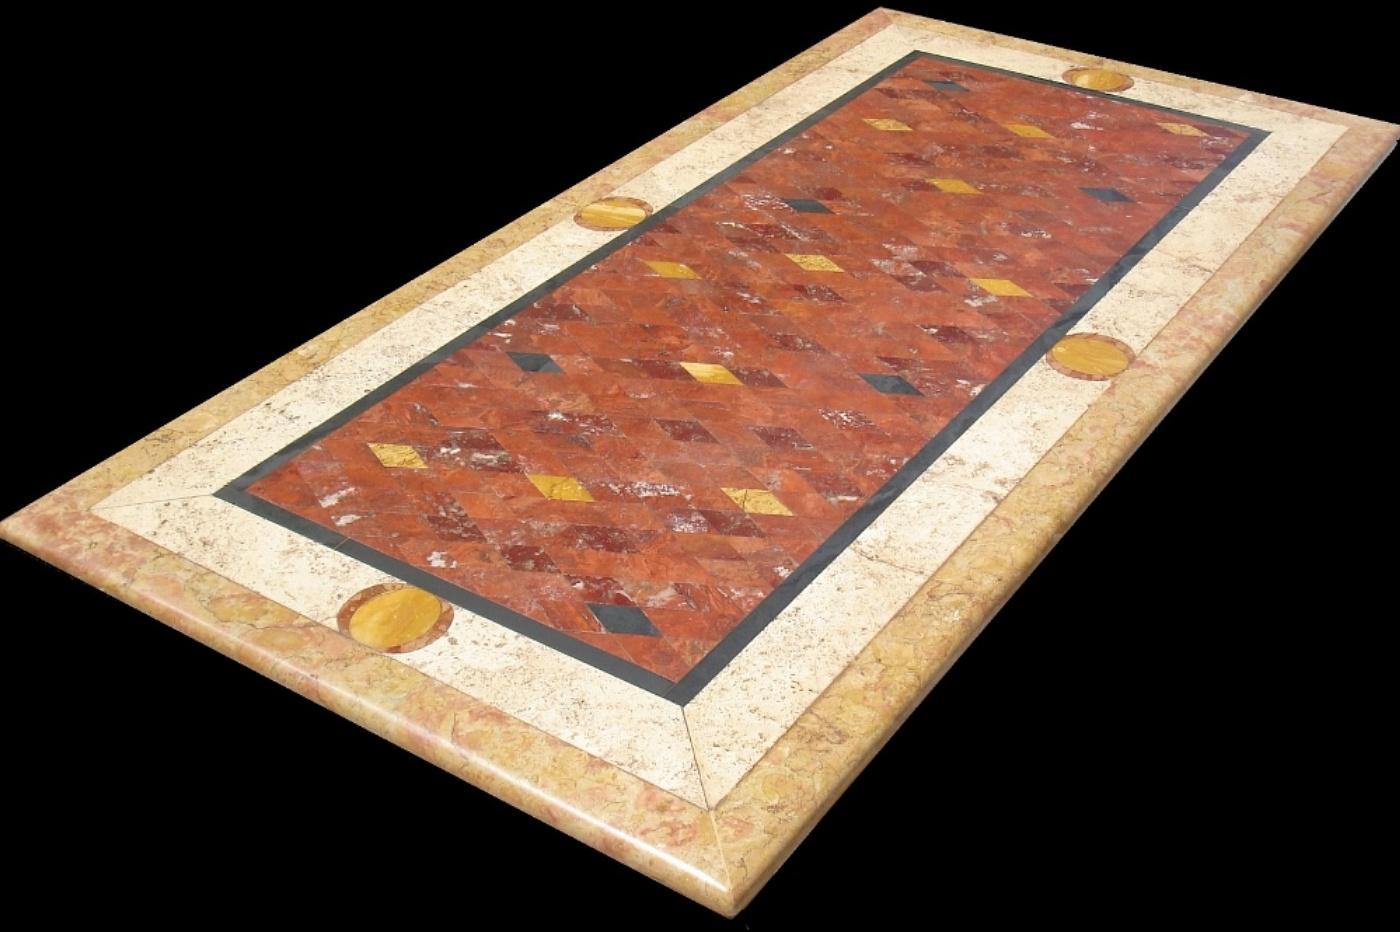 Tavoli In Marmo Da Giardino.La Bottega Delle Arti Antiche Tavolo Da Giardino In Marmi